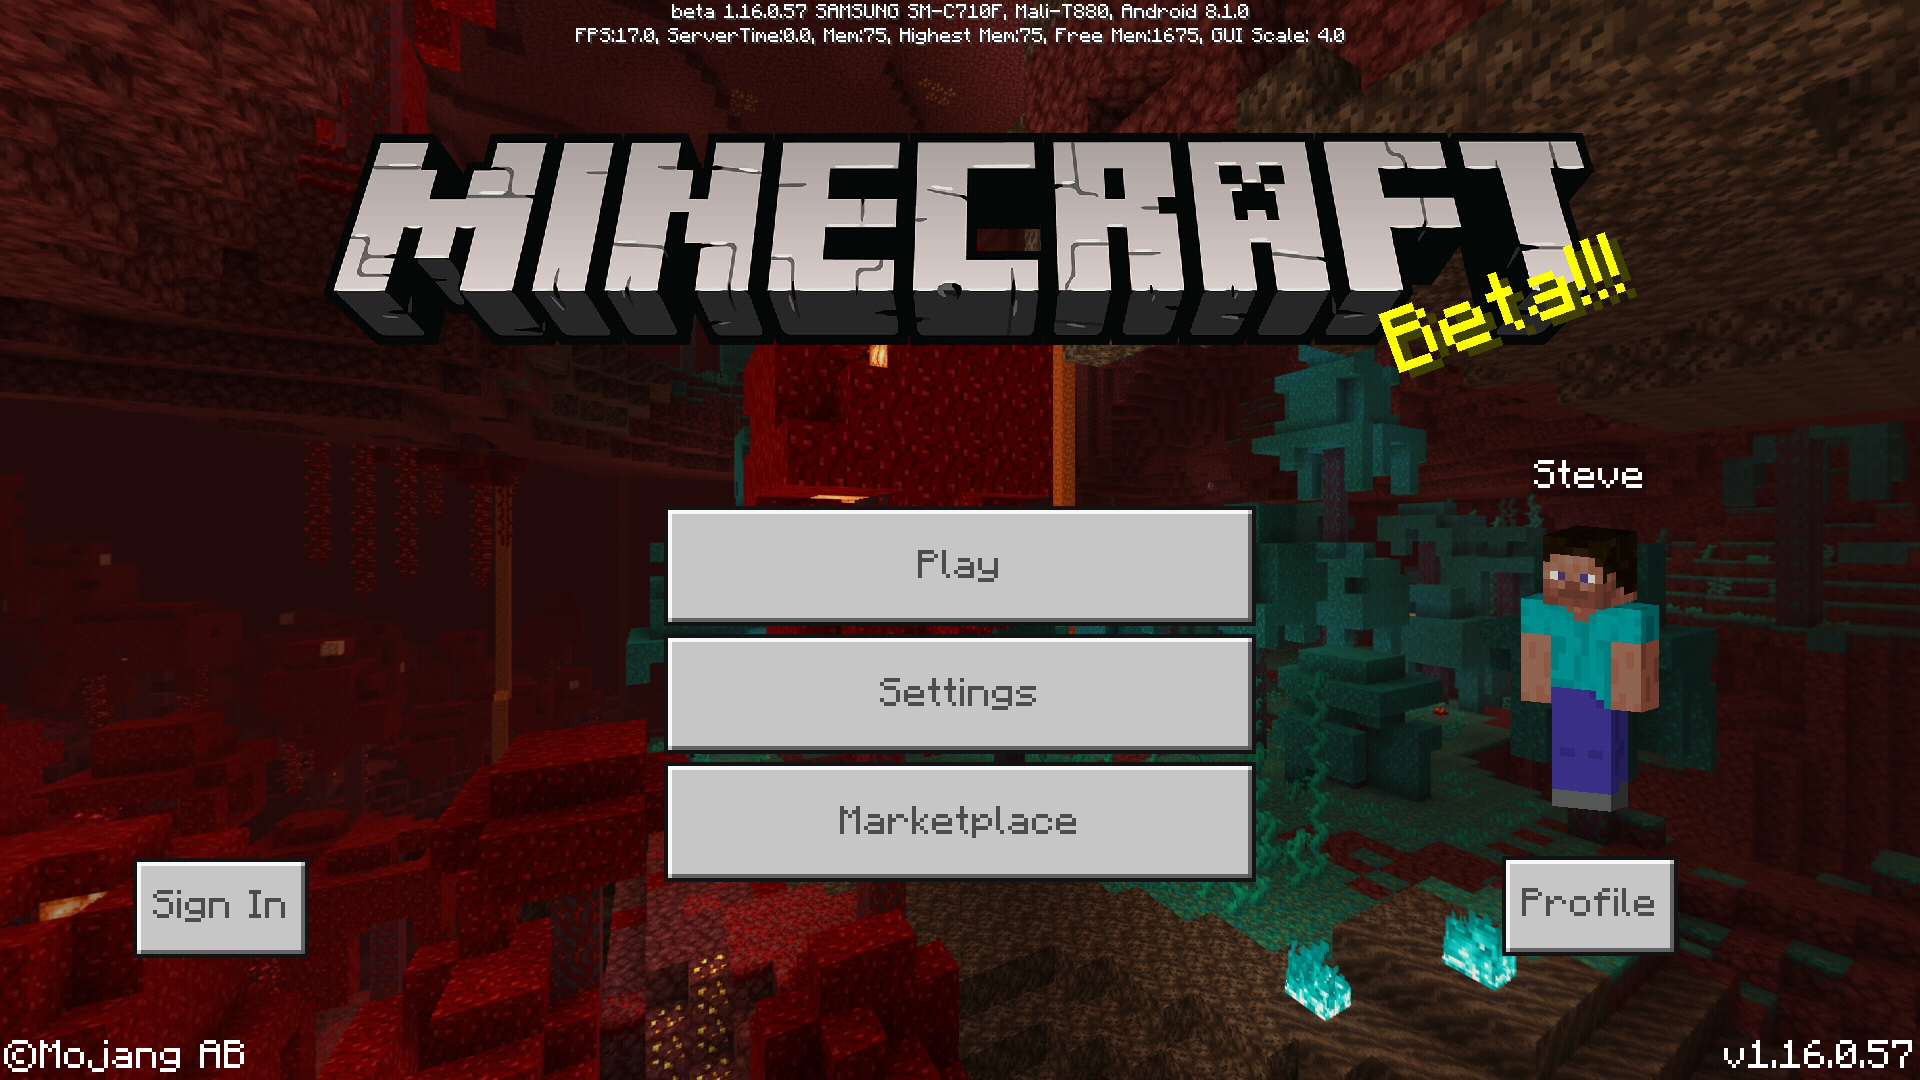 Bedrock Edition beta 11.111.11.11 – Official Minecraft Wiki